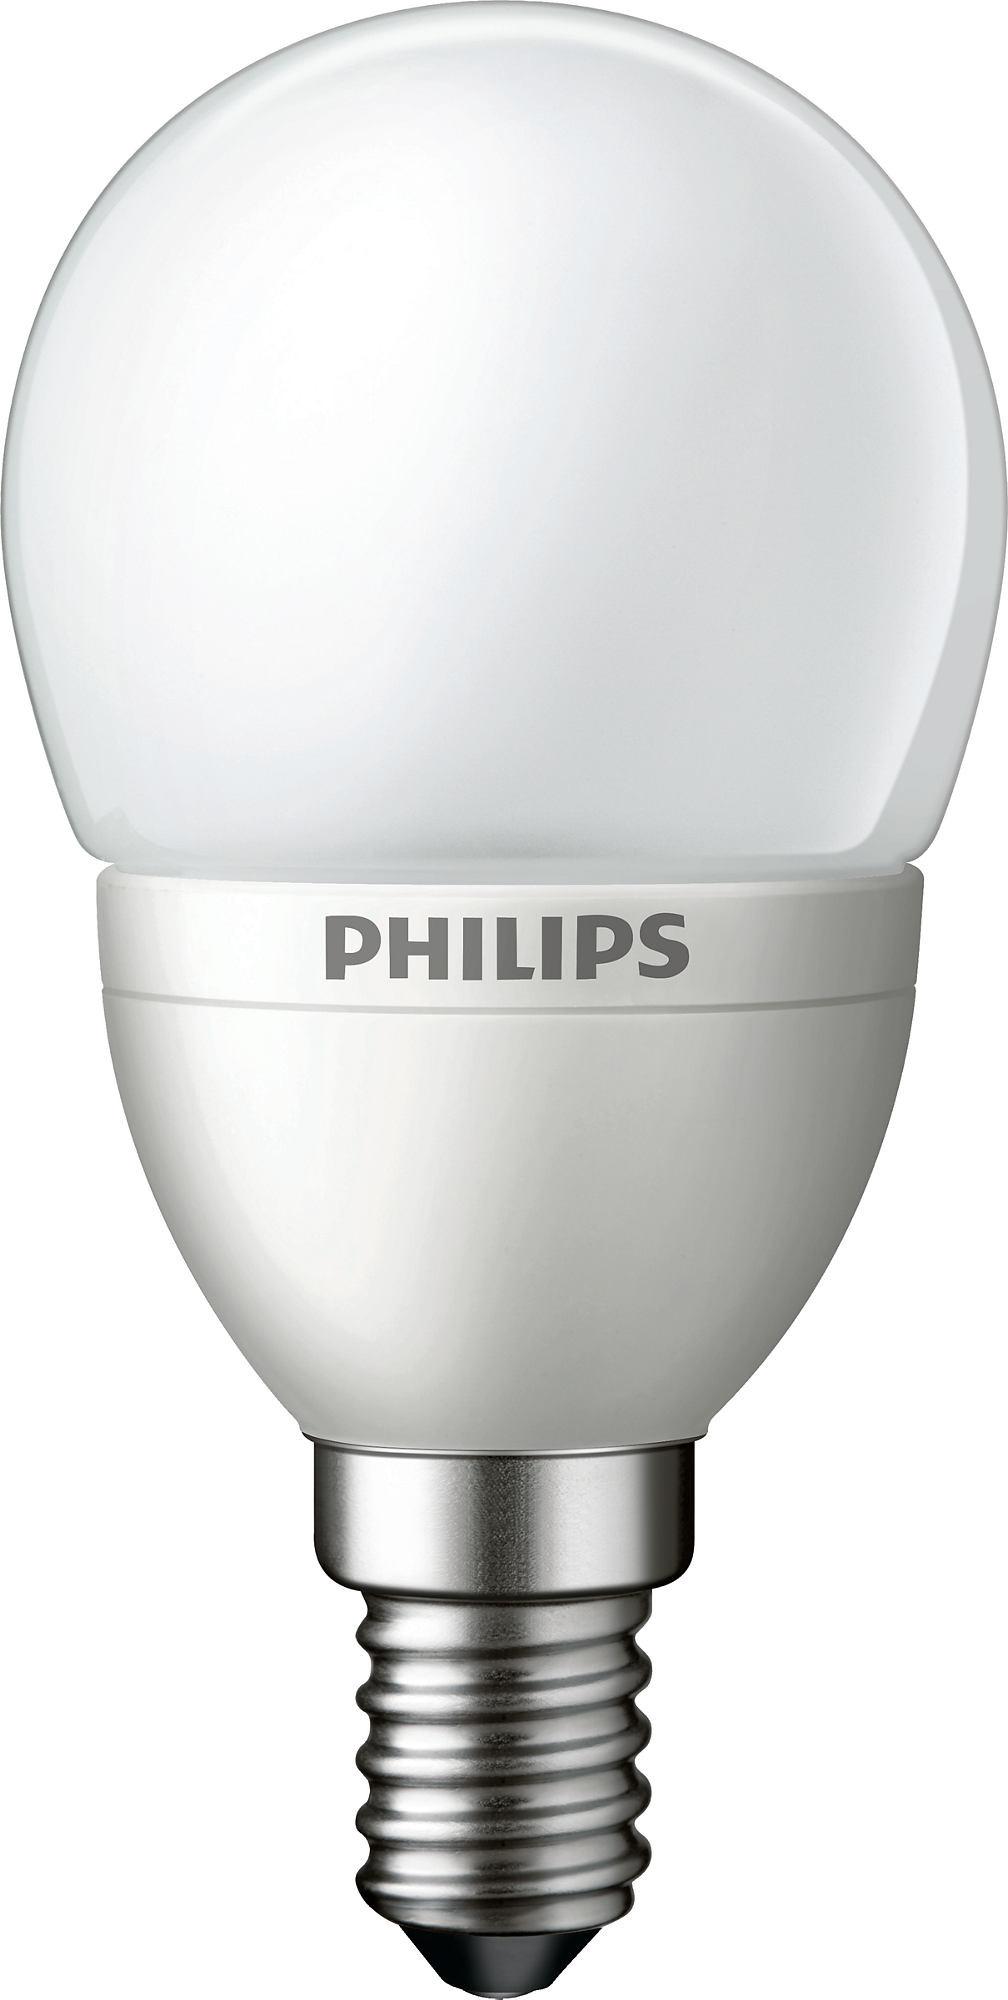 Philips CorePro LEDluster 4-25W E14 827 P45 FR